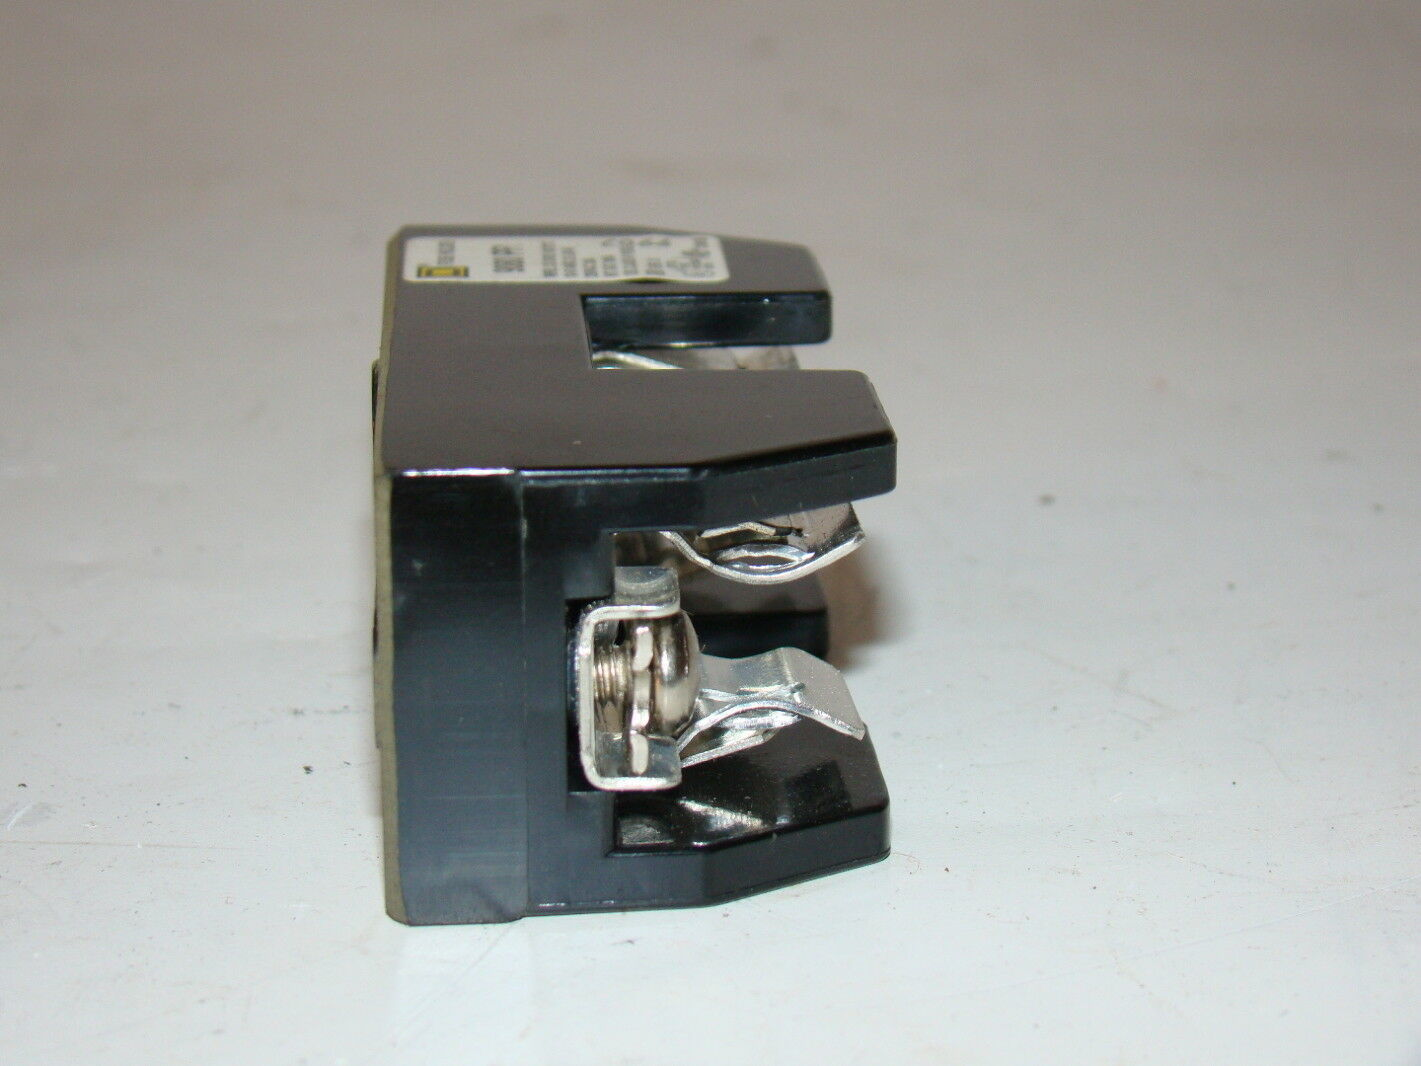 square d fuse holder 9080pf1 | ebay square d fuse box parts square d fuse box latch